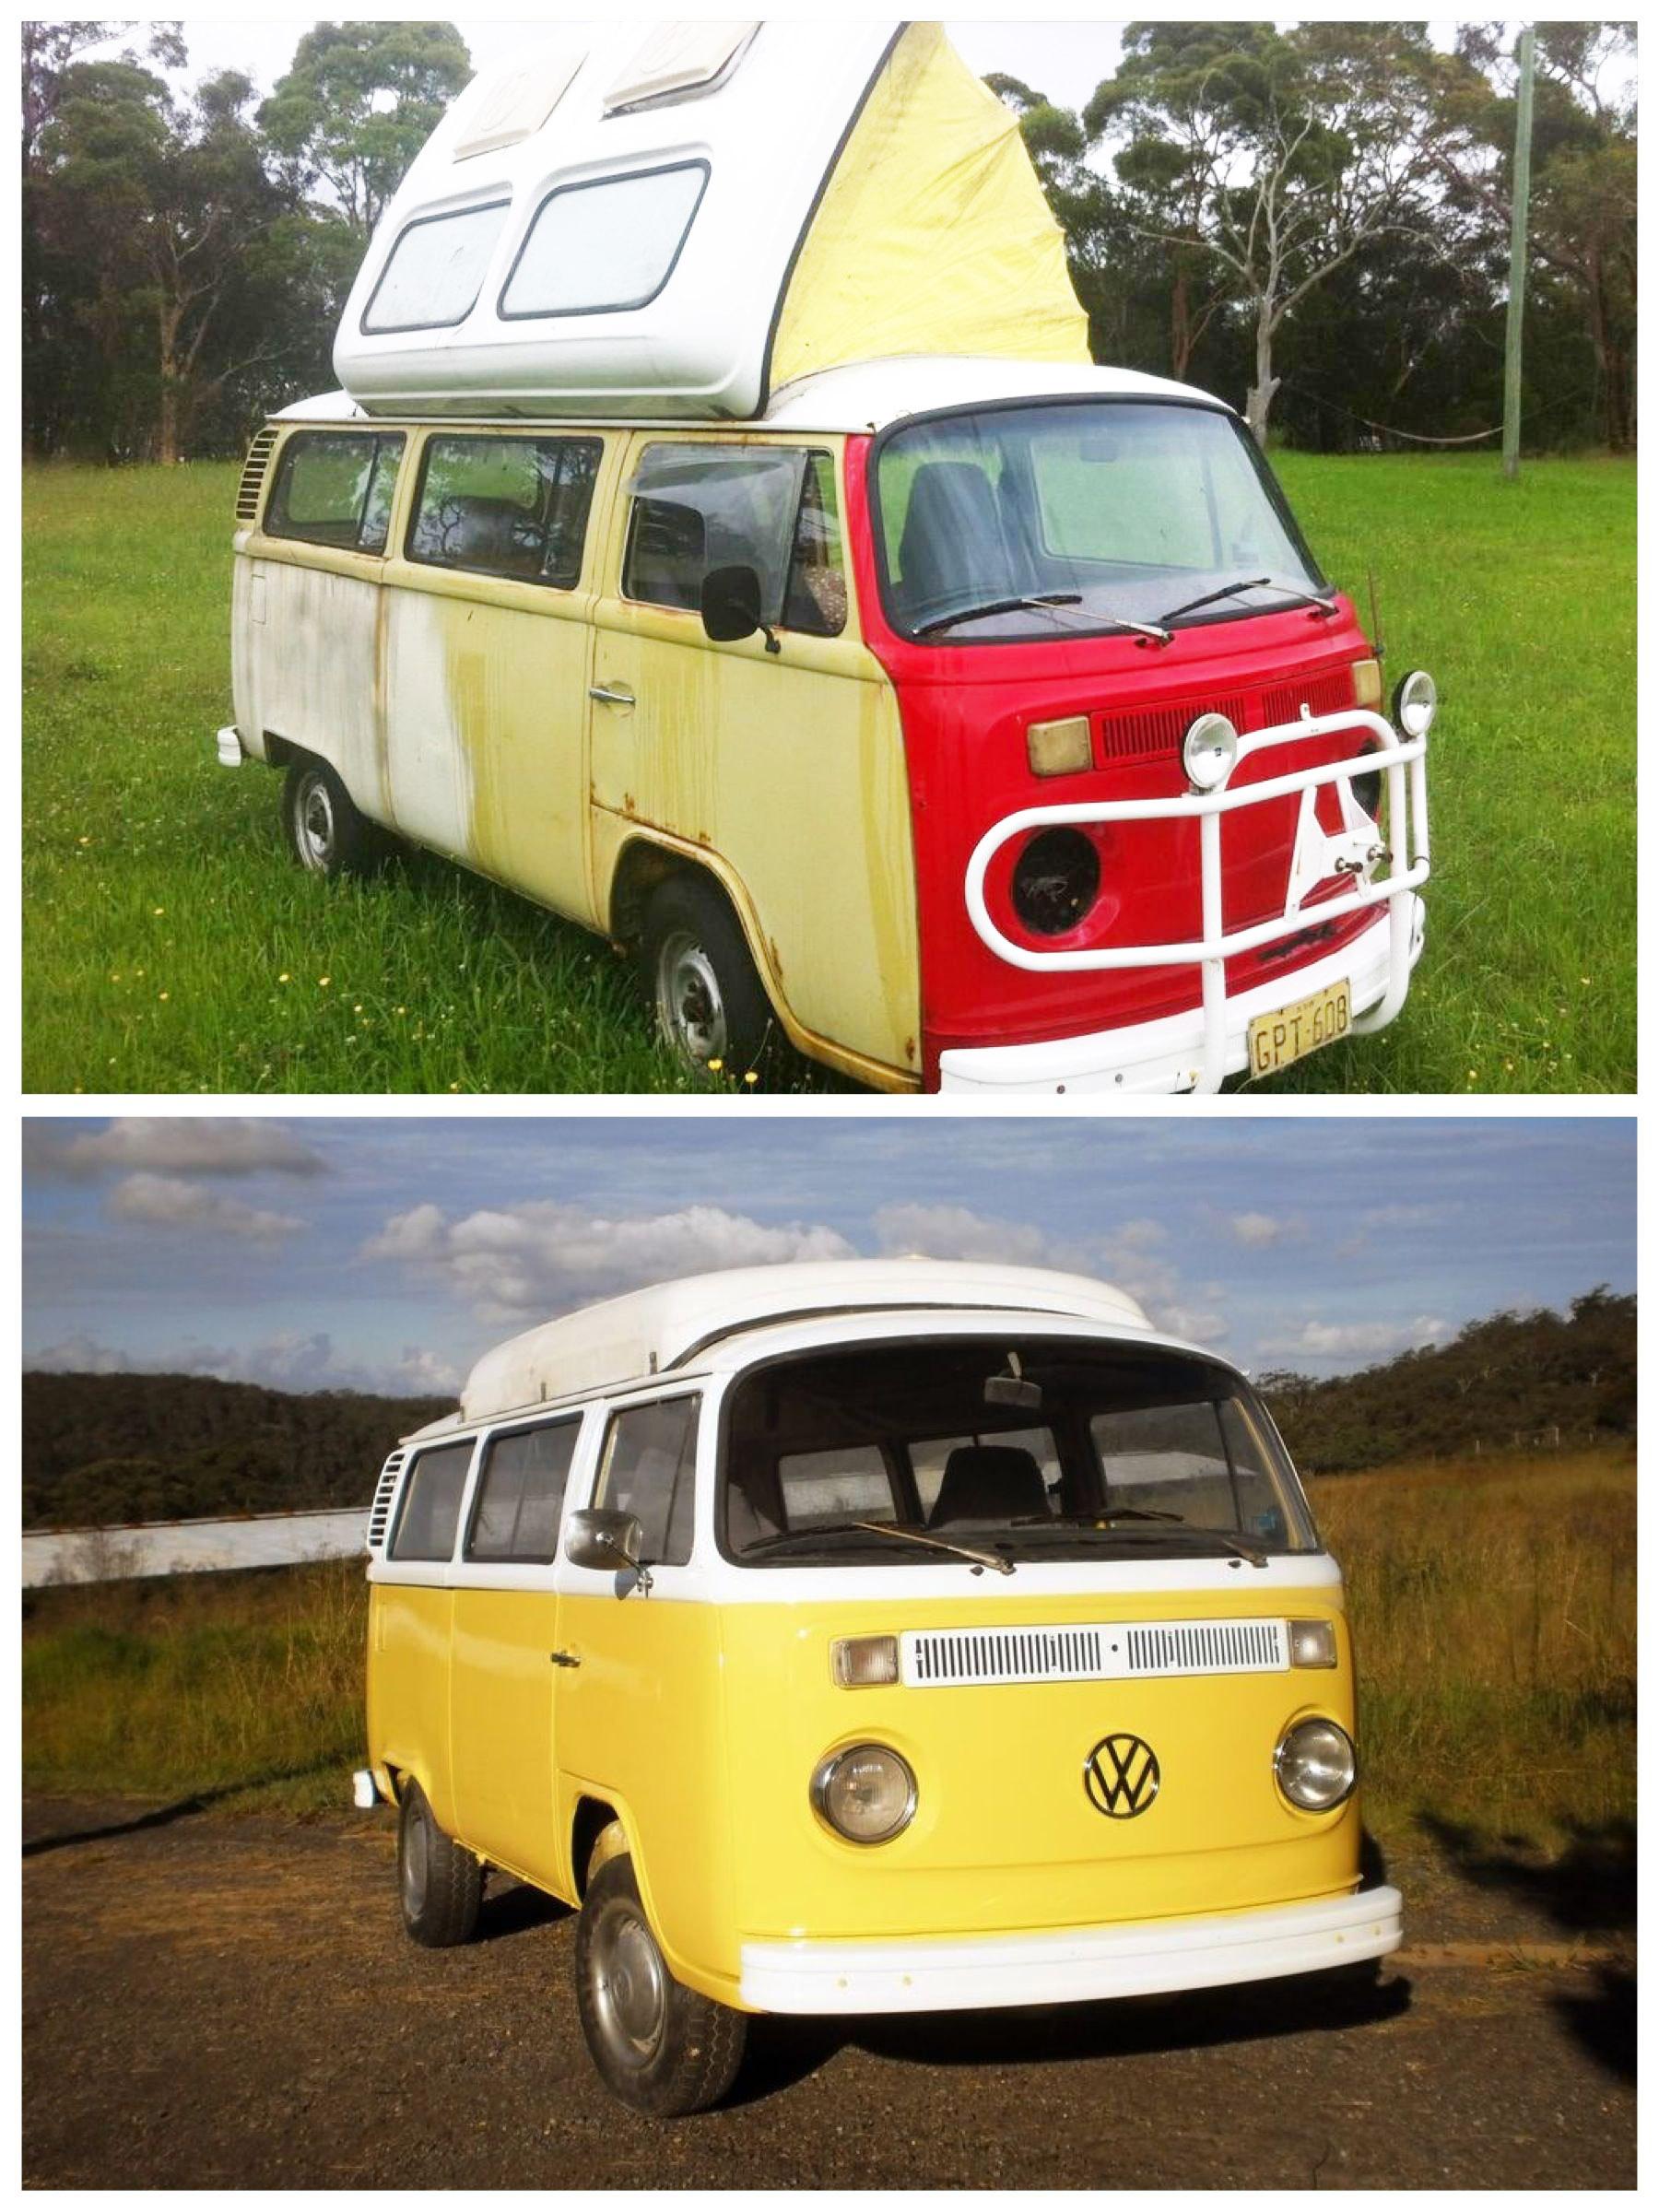 online sale sales pueblo bus air repair cooled for restoration co van volkswagen vw